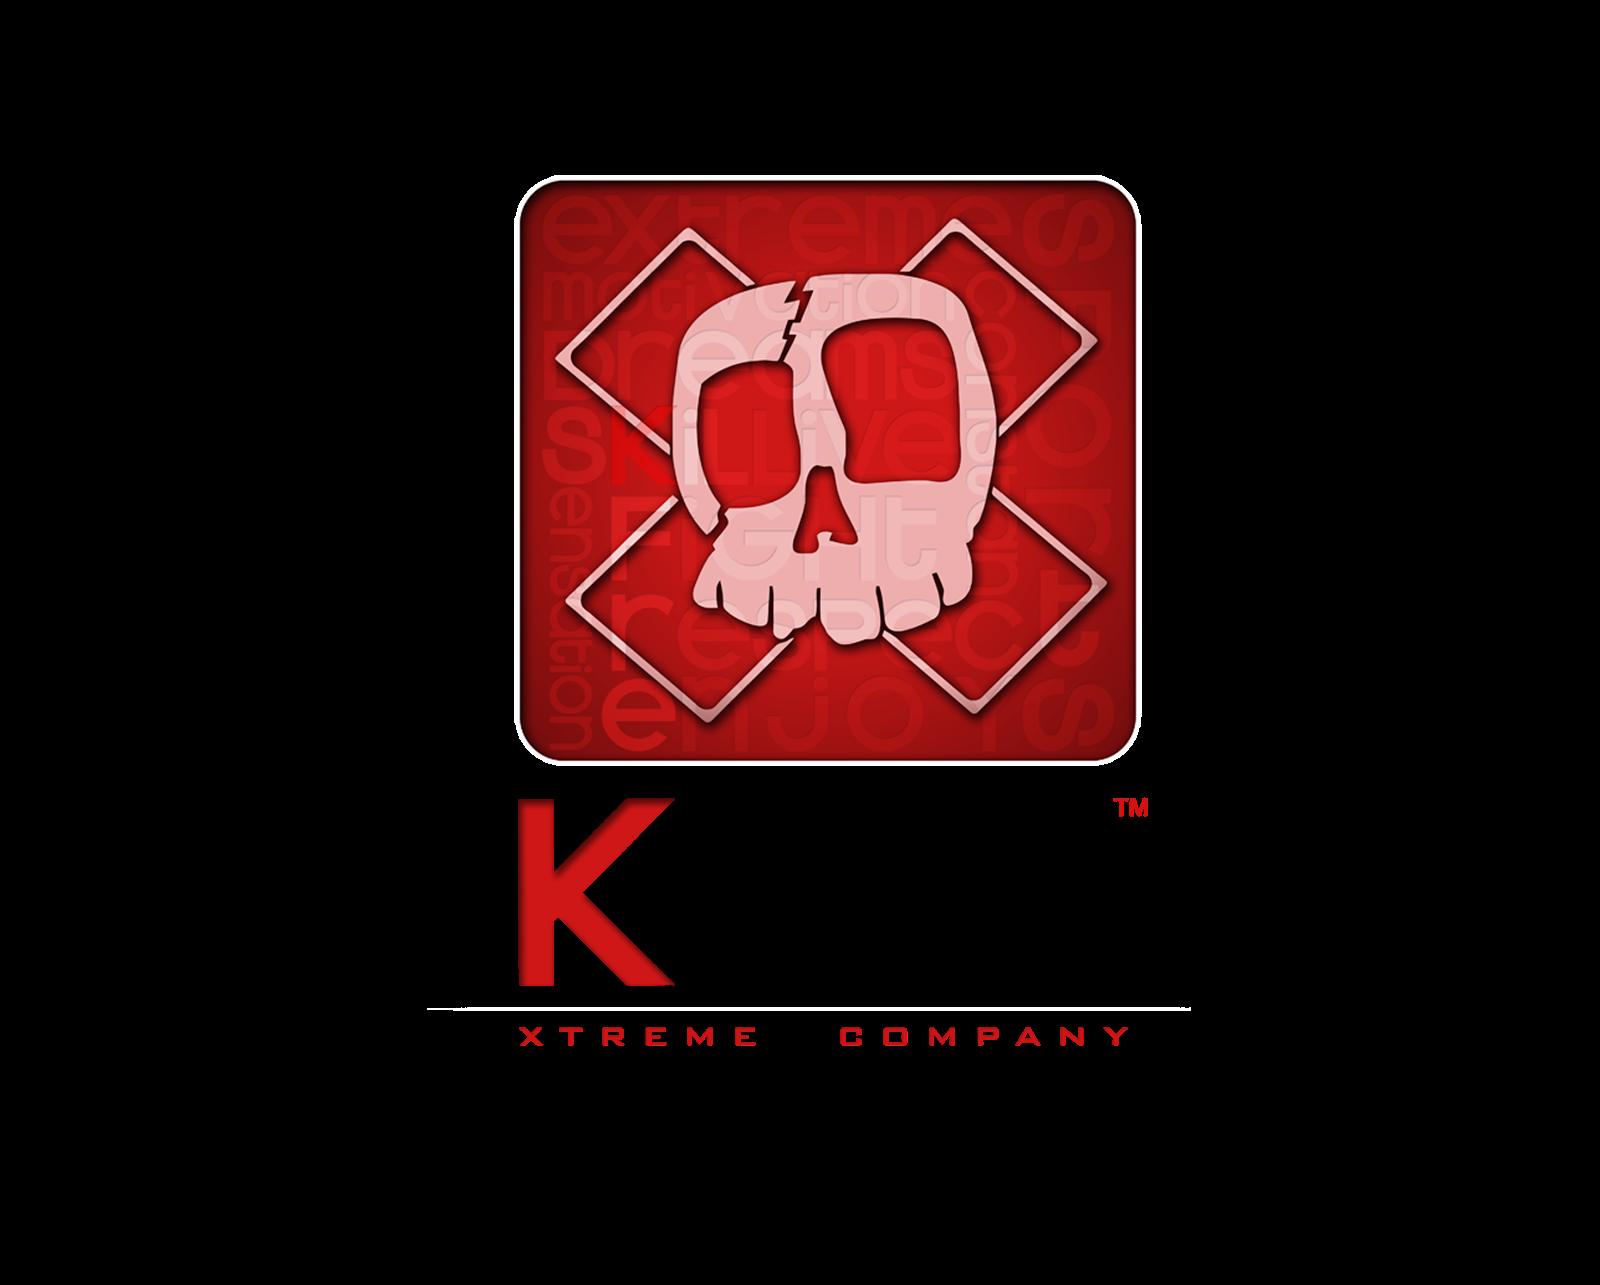 KFRE EXTREME COMPANY